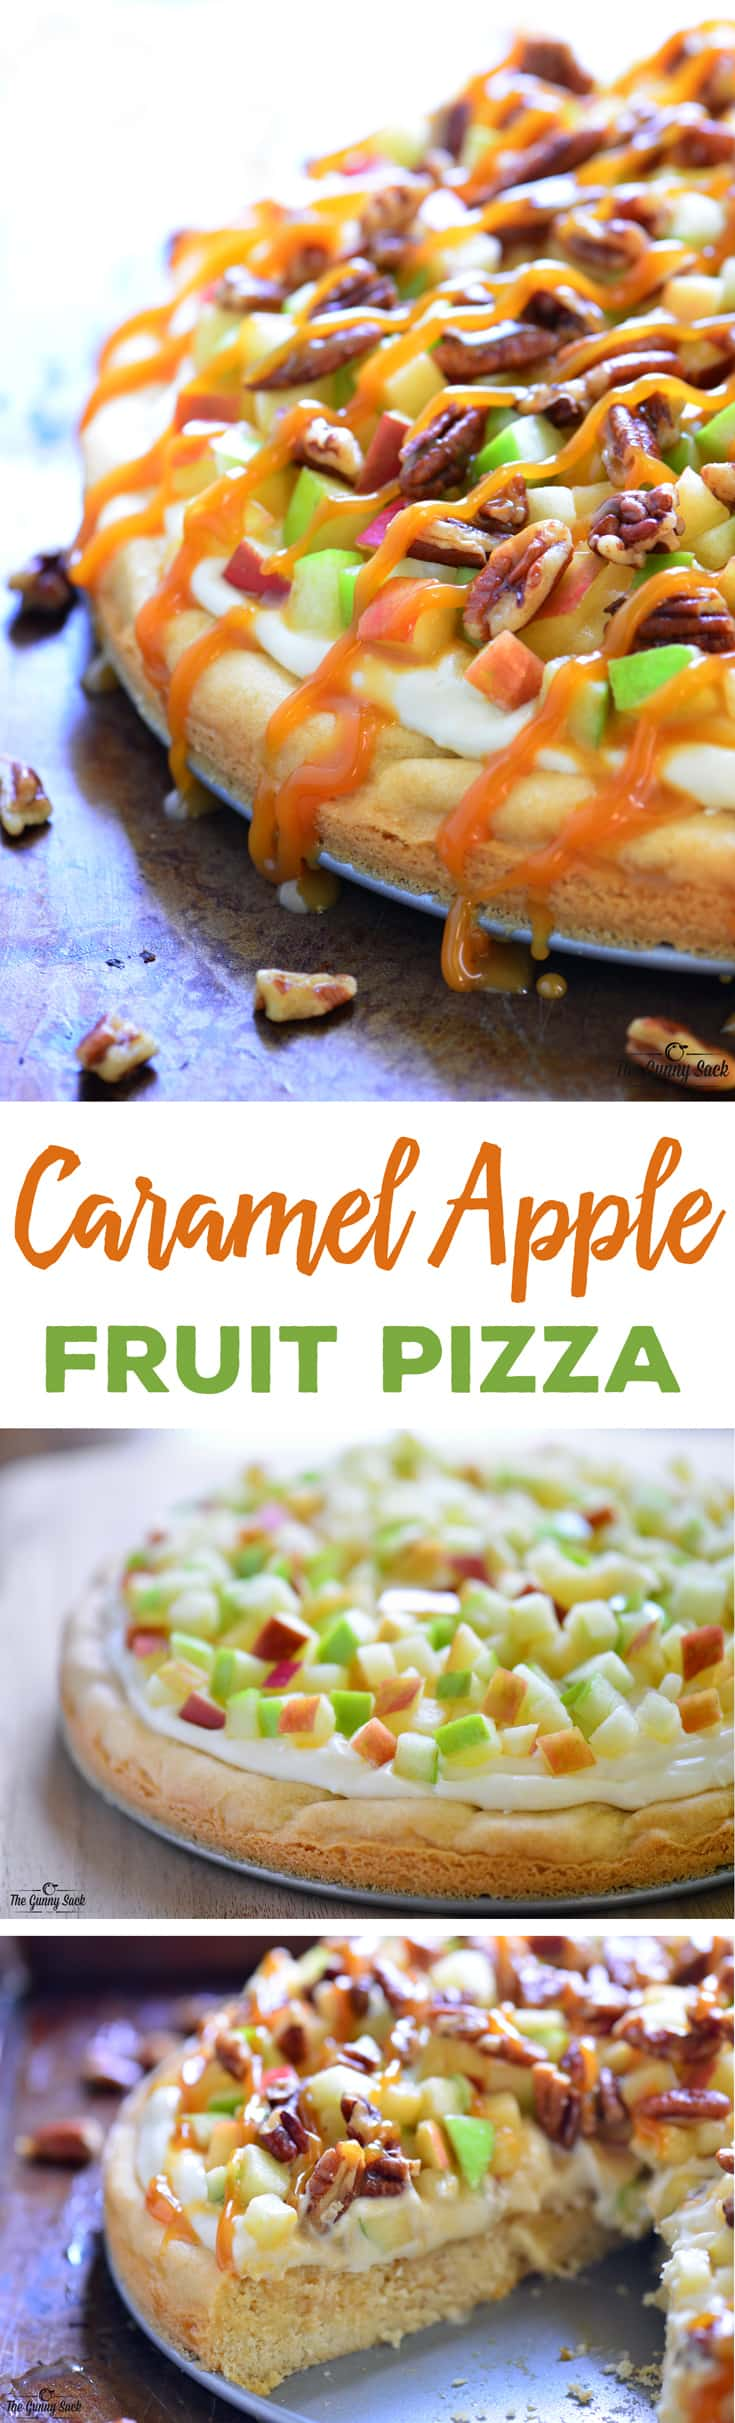 Caramel Apple Fruit Pizza Fall Dessert Recipe